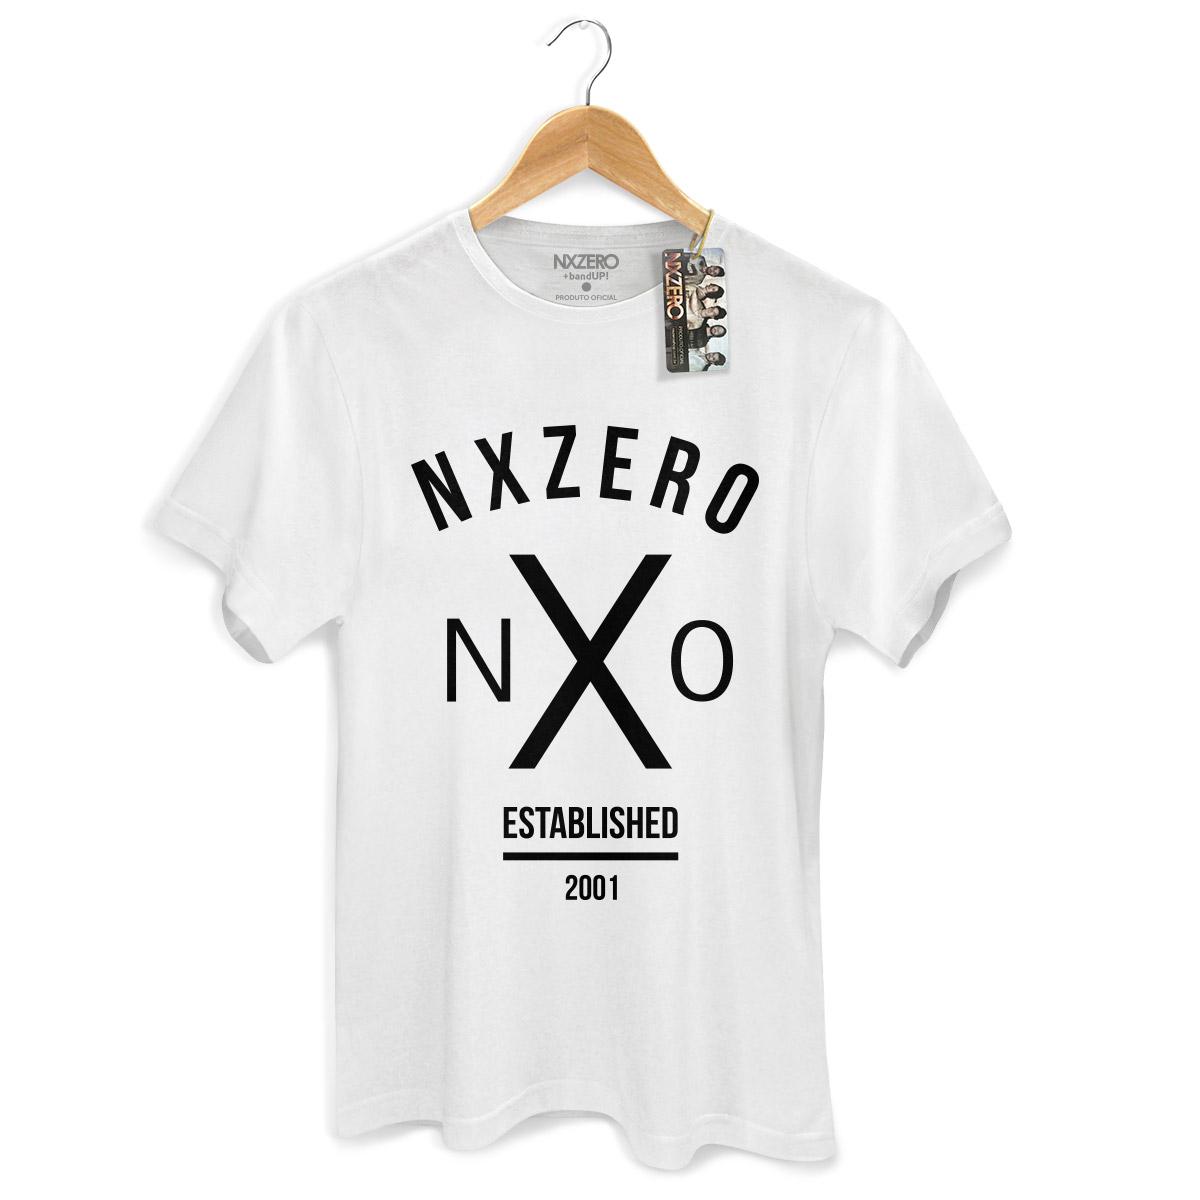 Camiseta Masculina NXZero NX0 Modelo 2